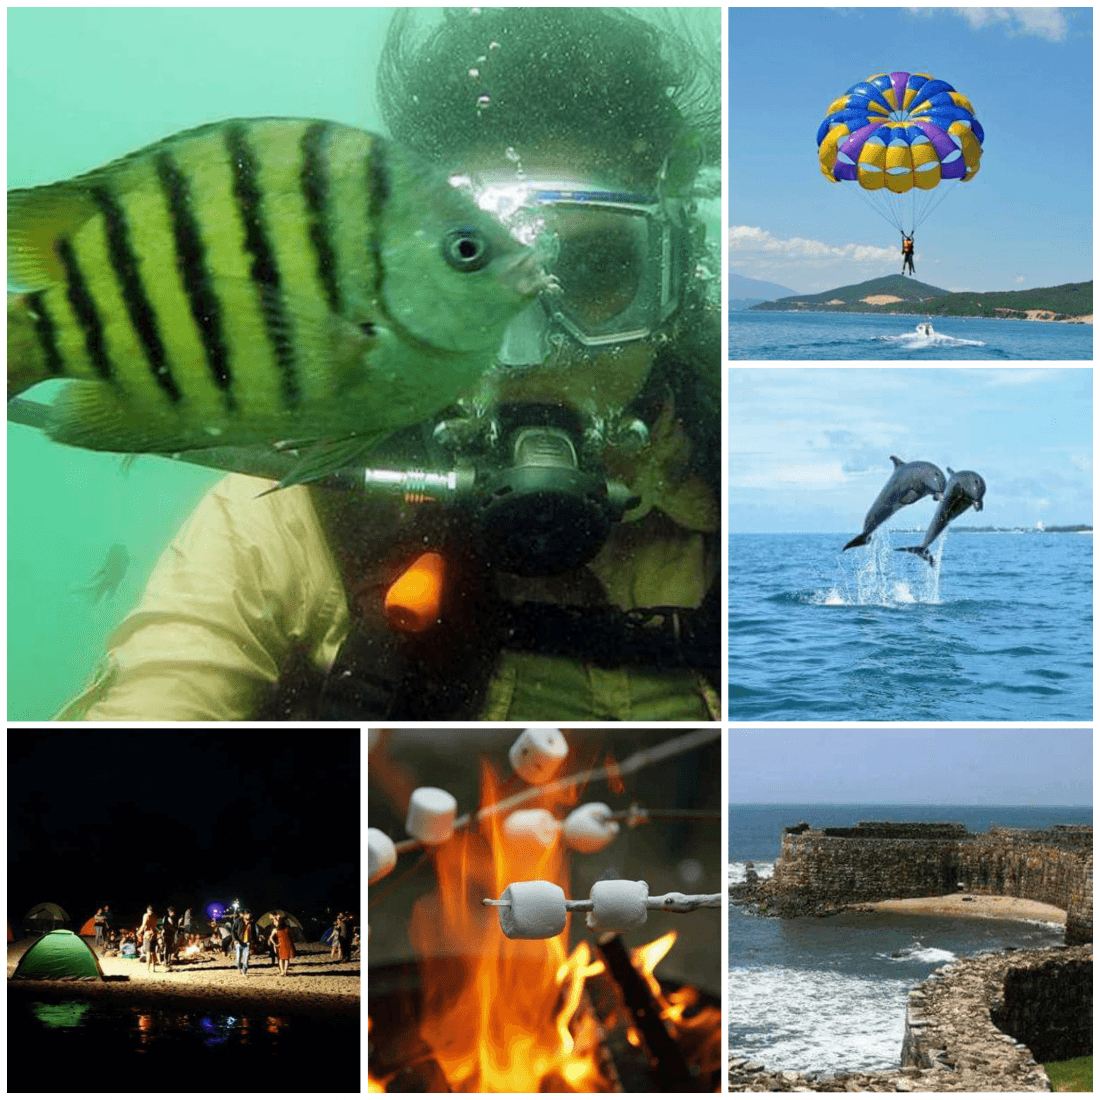 Kokan Trip  Tarkarli Scuba Diving Beach Camping  Parasailing  Watersports Trip